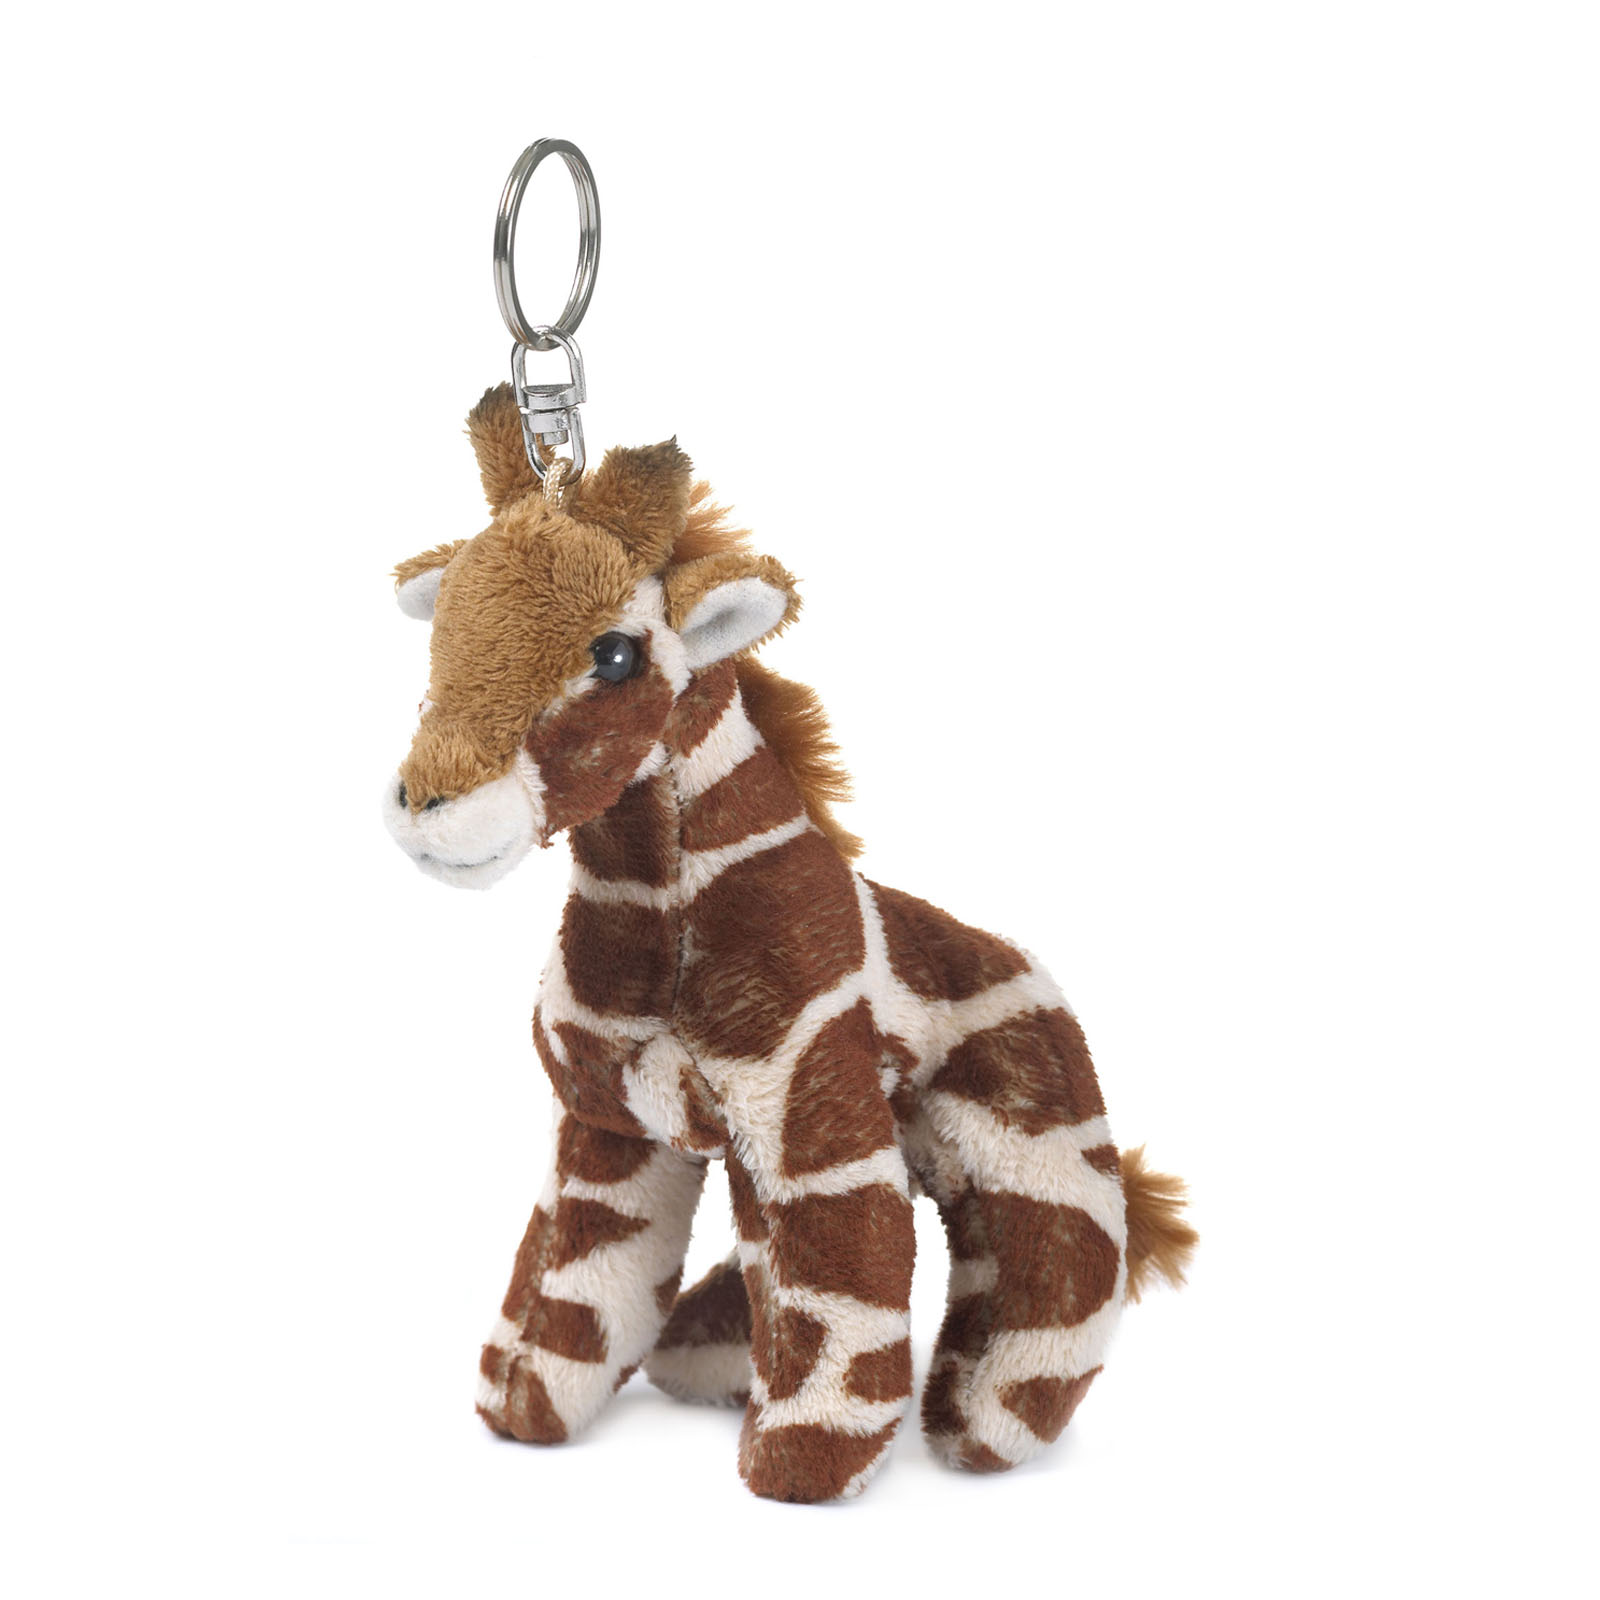 WWF-Plush-Giraffe-toy-Keychain-4-Inches